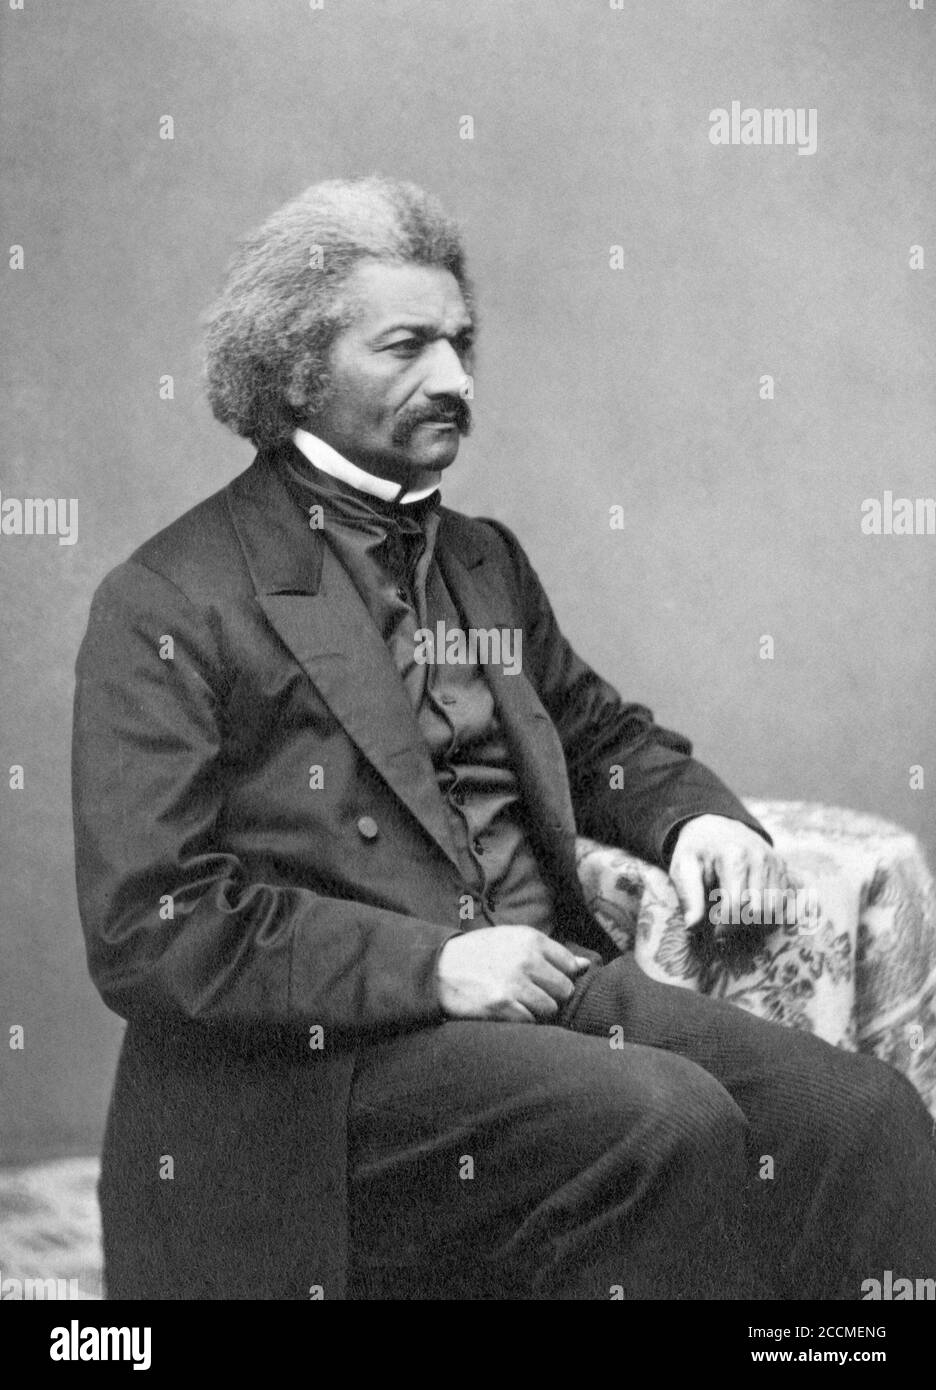 Retrato de Frederick Douglass (1818-1895), c.1864. Douglass, un ex esclavo, era un reformador social, abolicionista, orador, escritor y estadista estadounidense Foto de stock